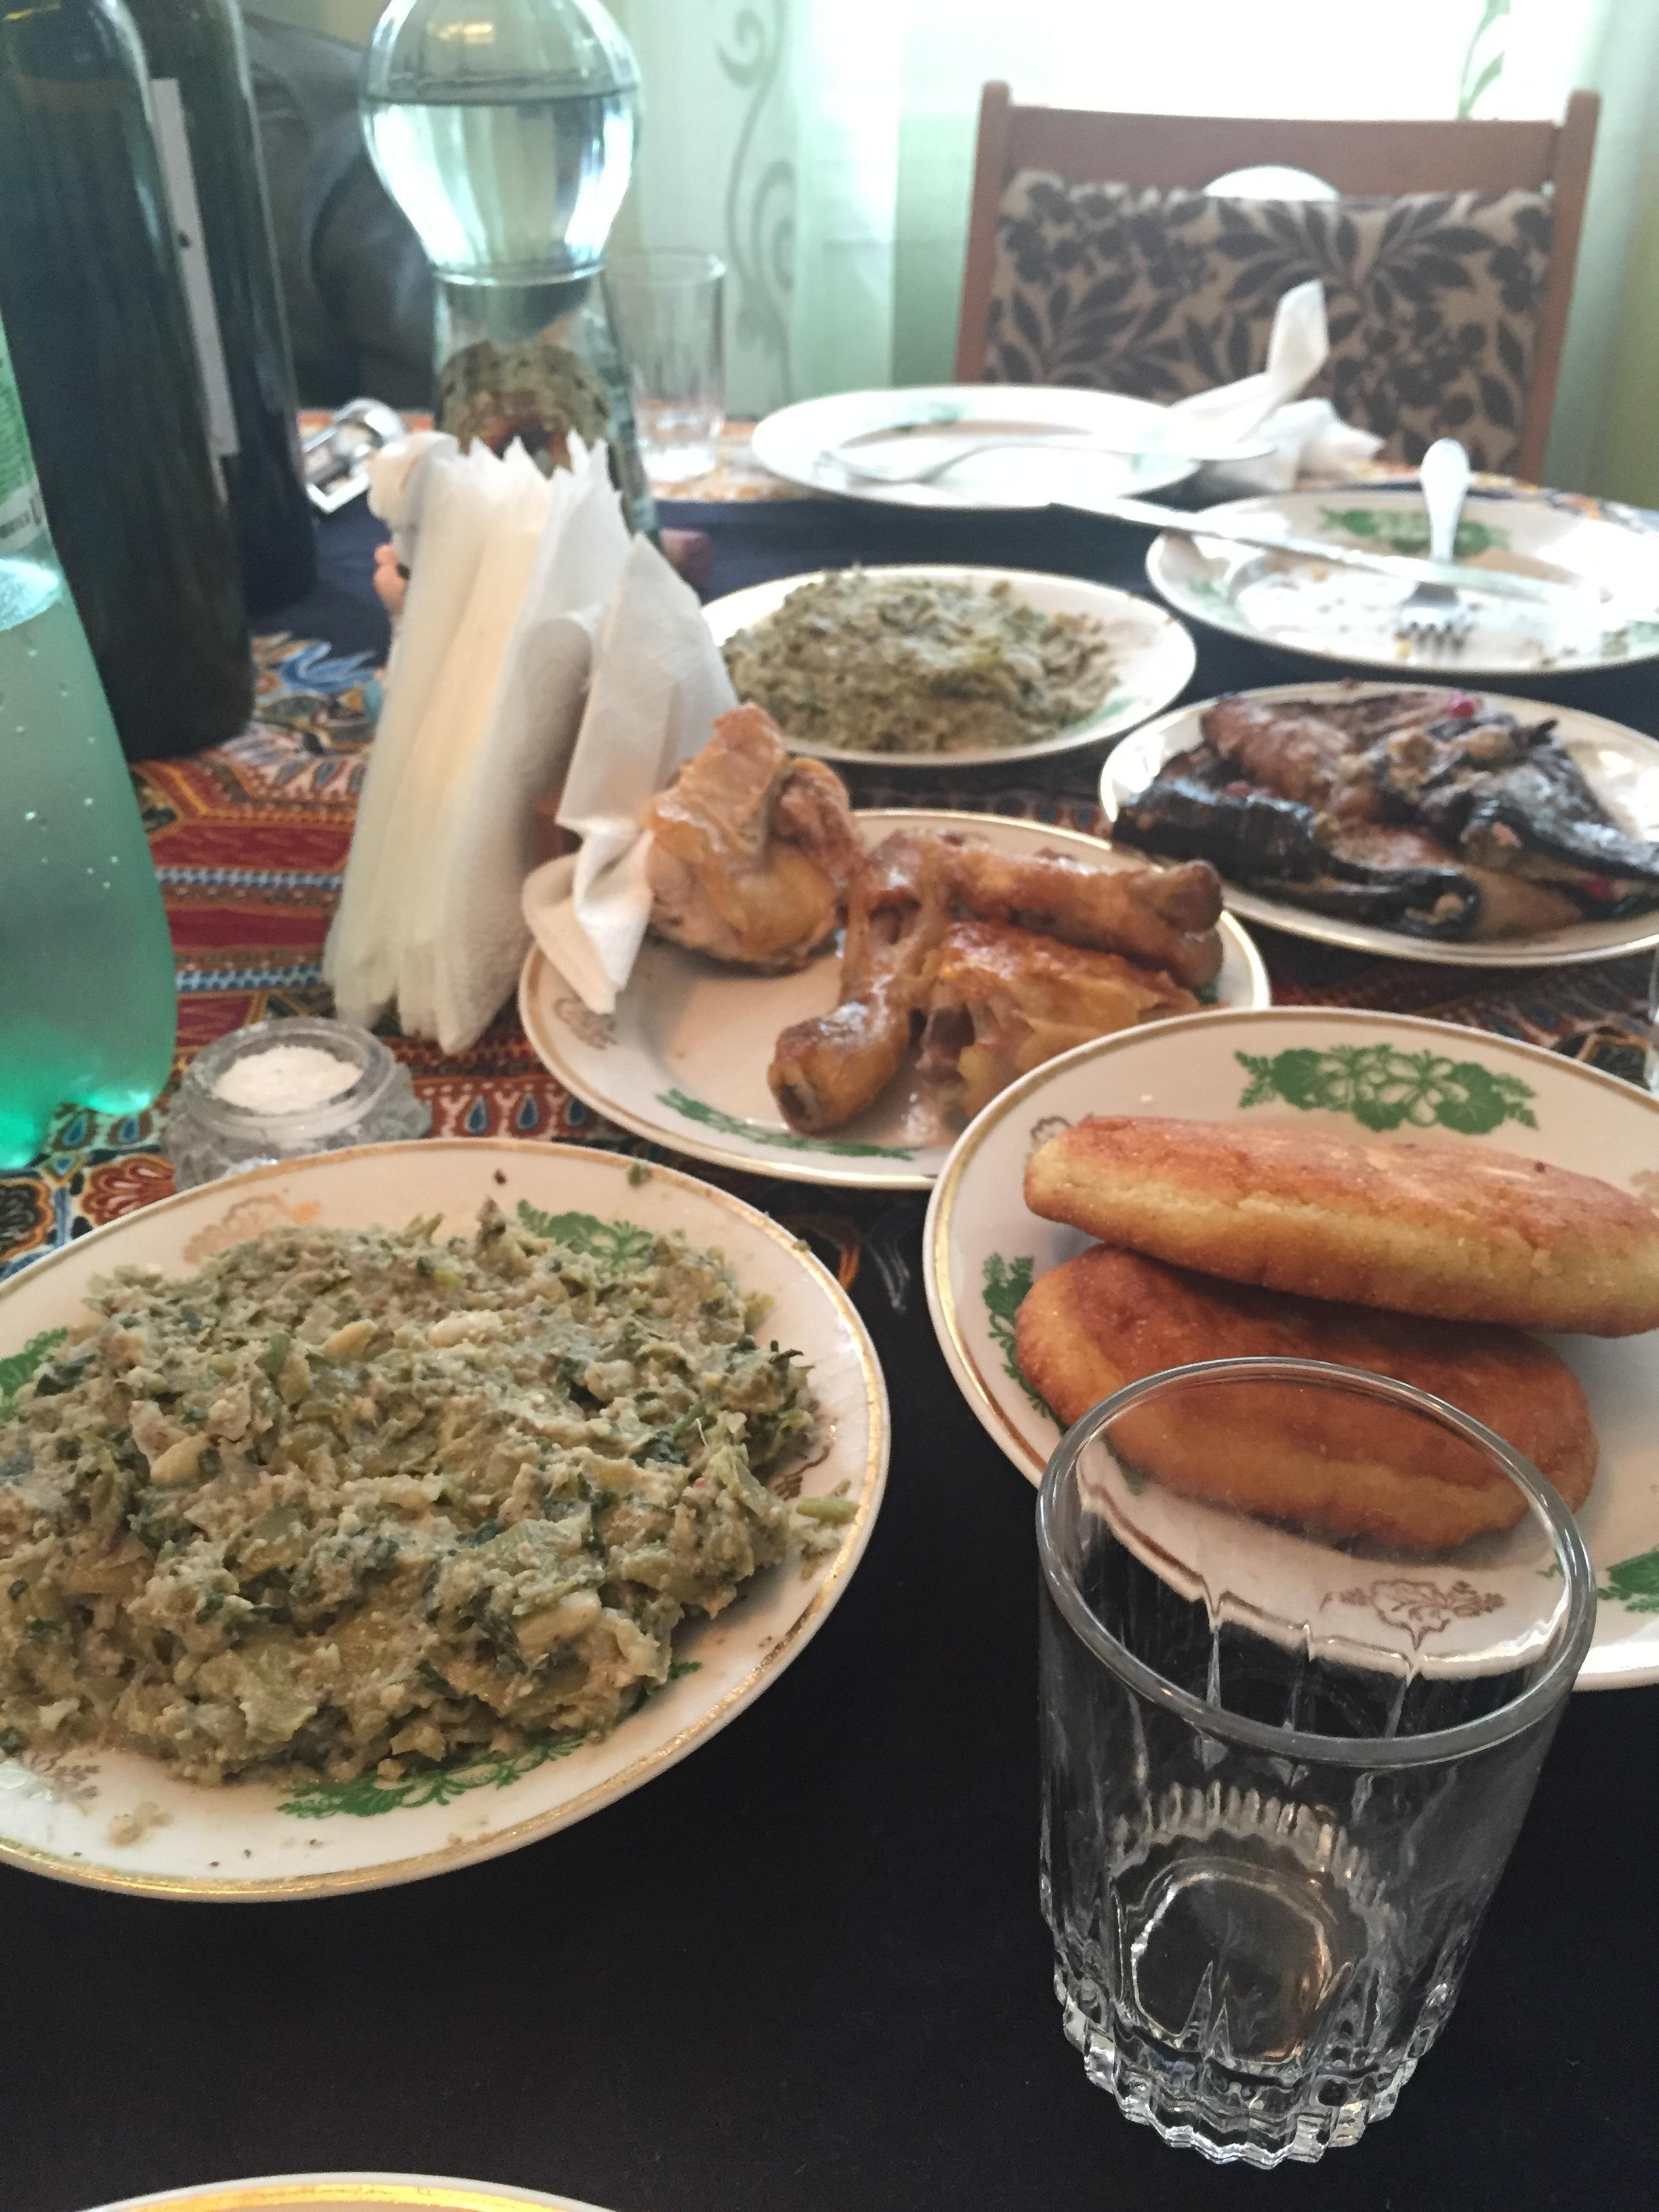 Tons of amazing food!